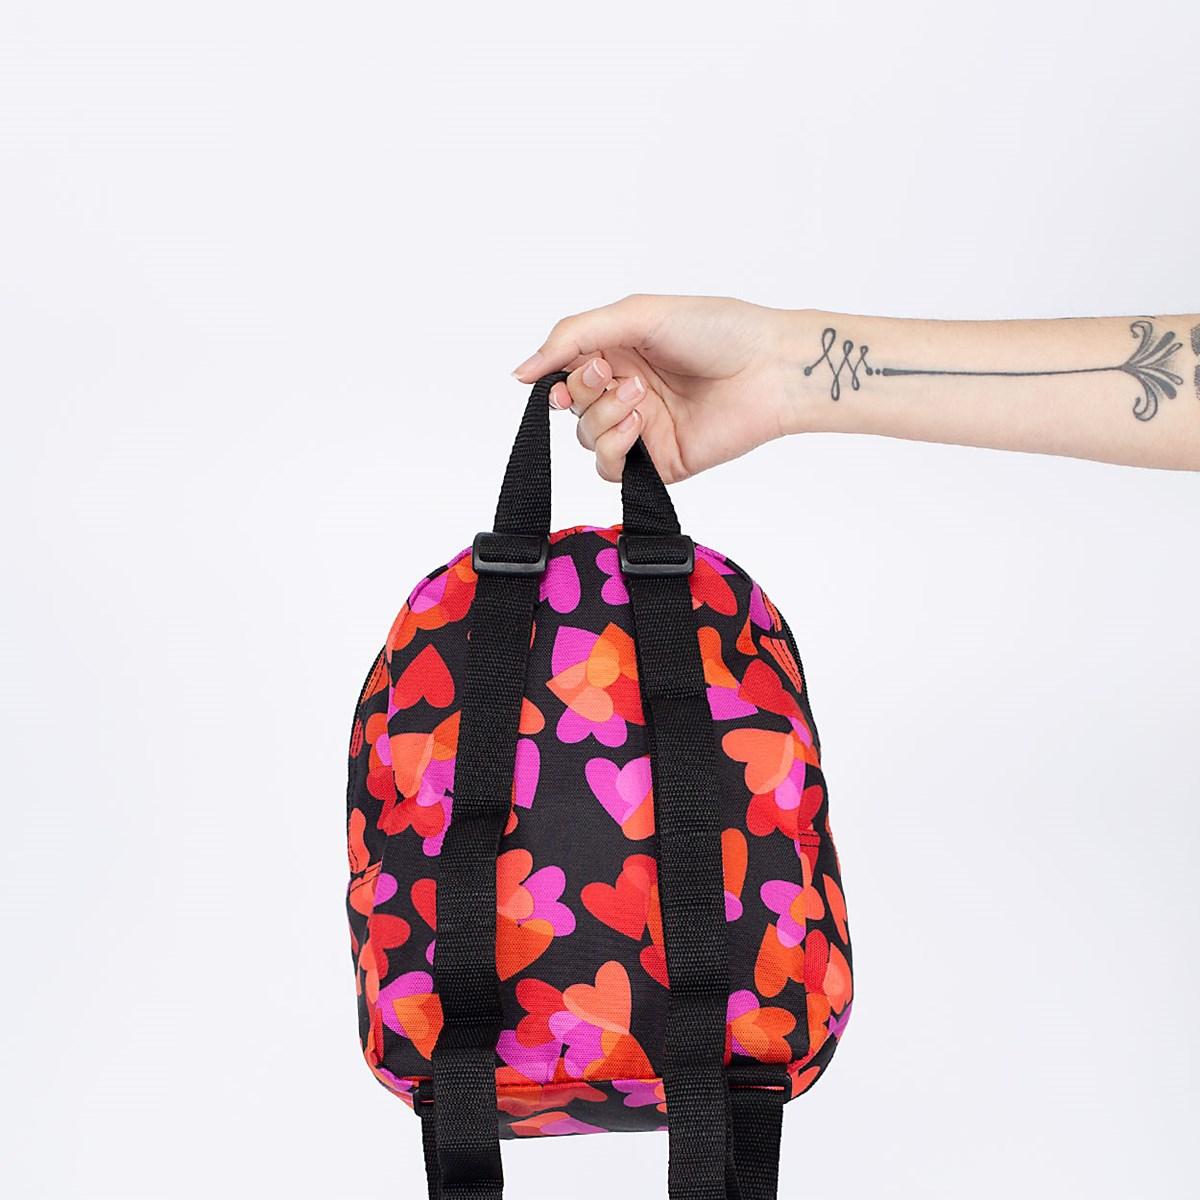 Mochila Vans Got This Mini Backpack Valentines VN0A3Z7WZH2